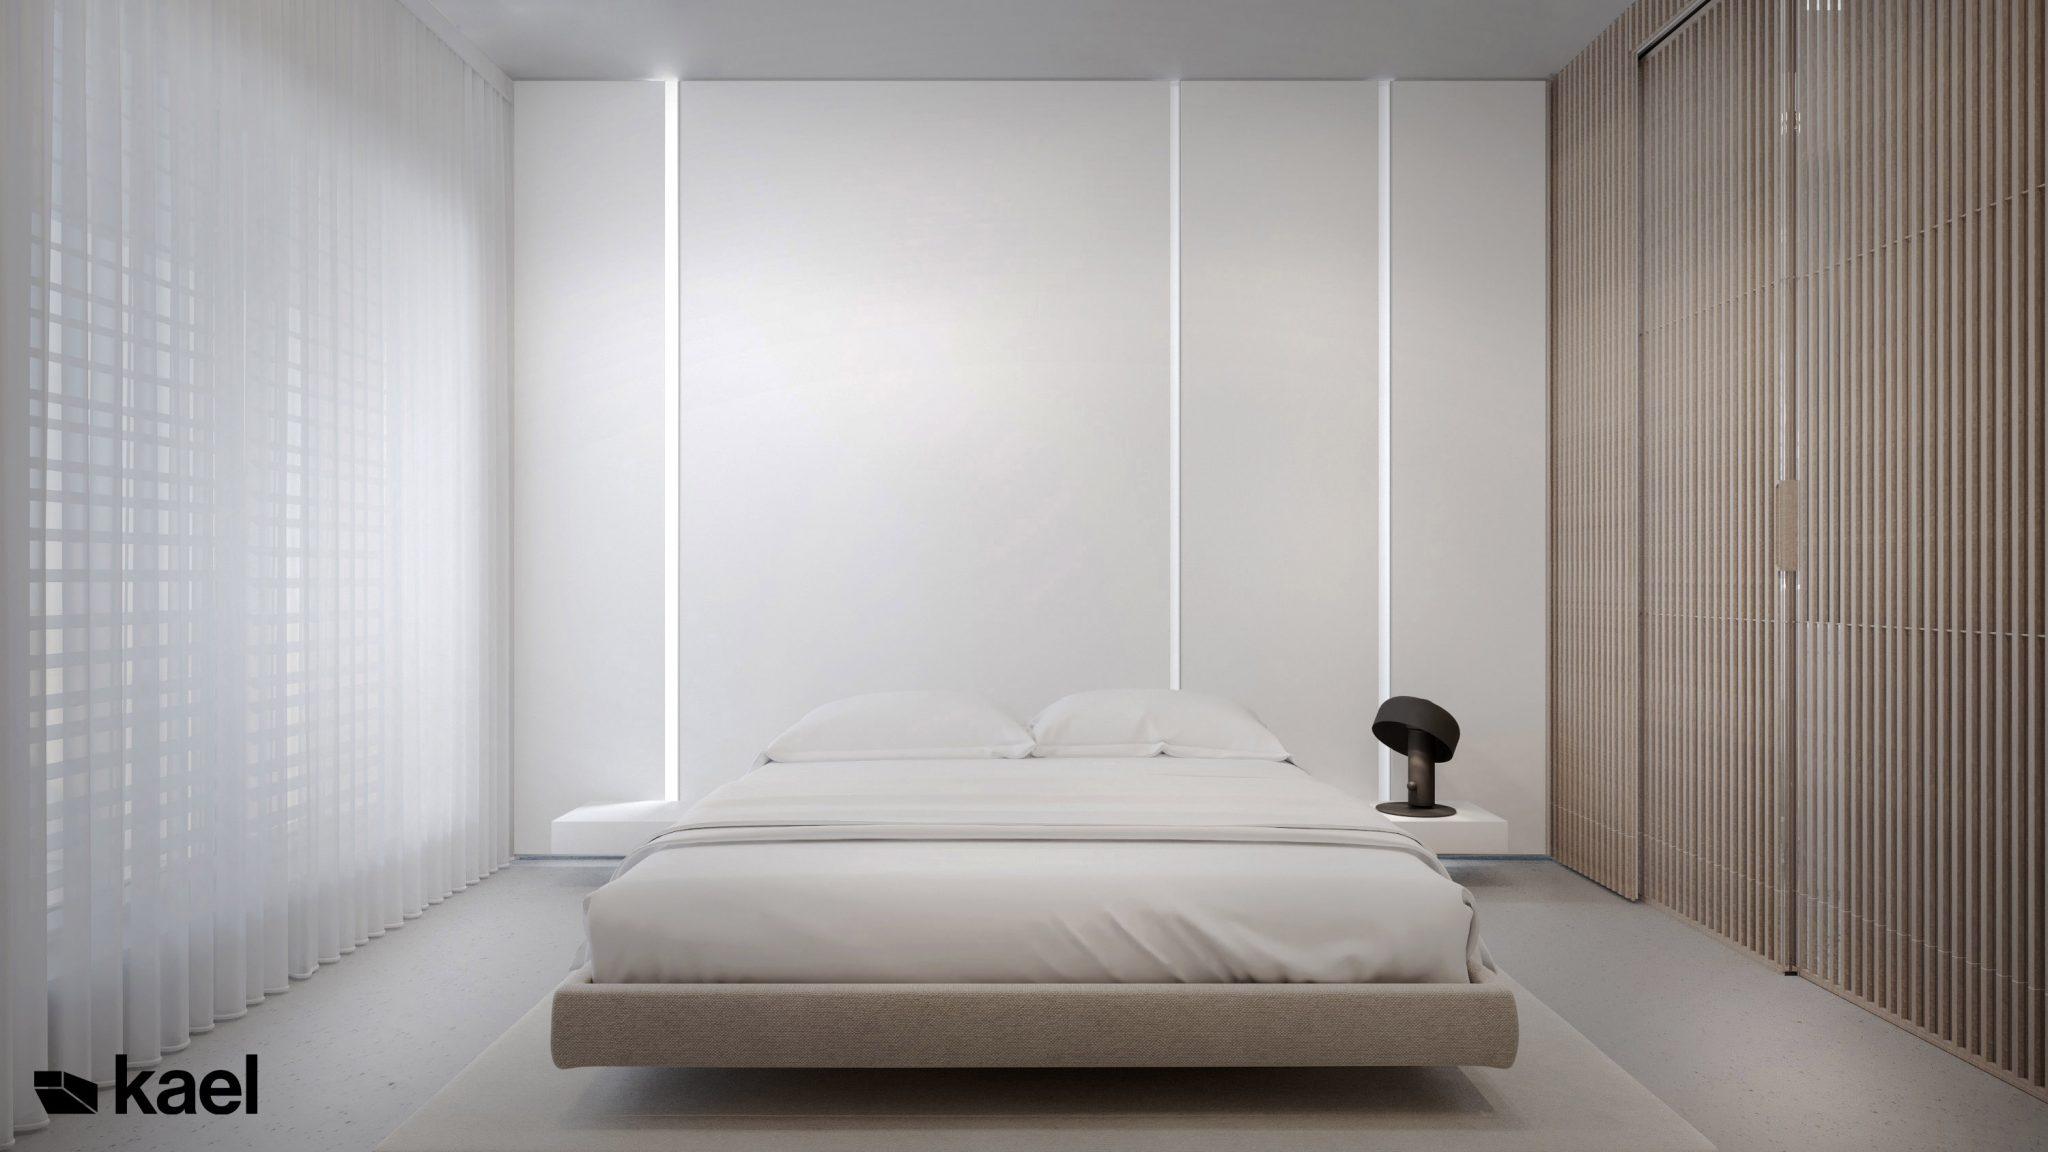 Sypialnia - Palestera - projekt wnętrza Kael